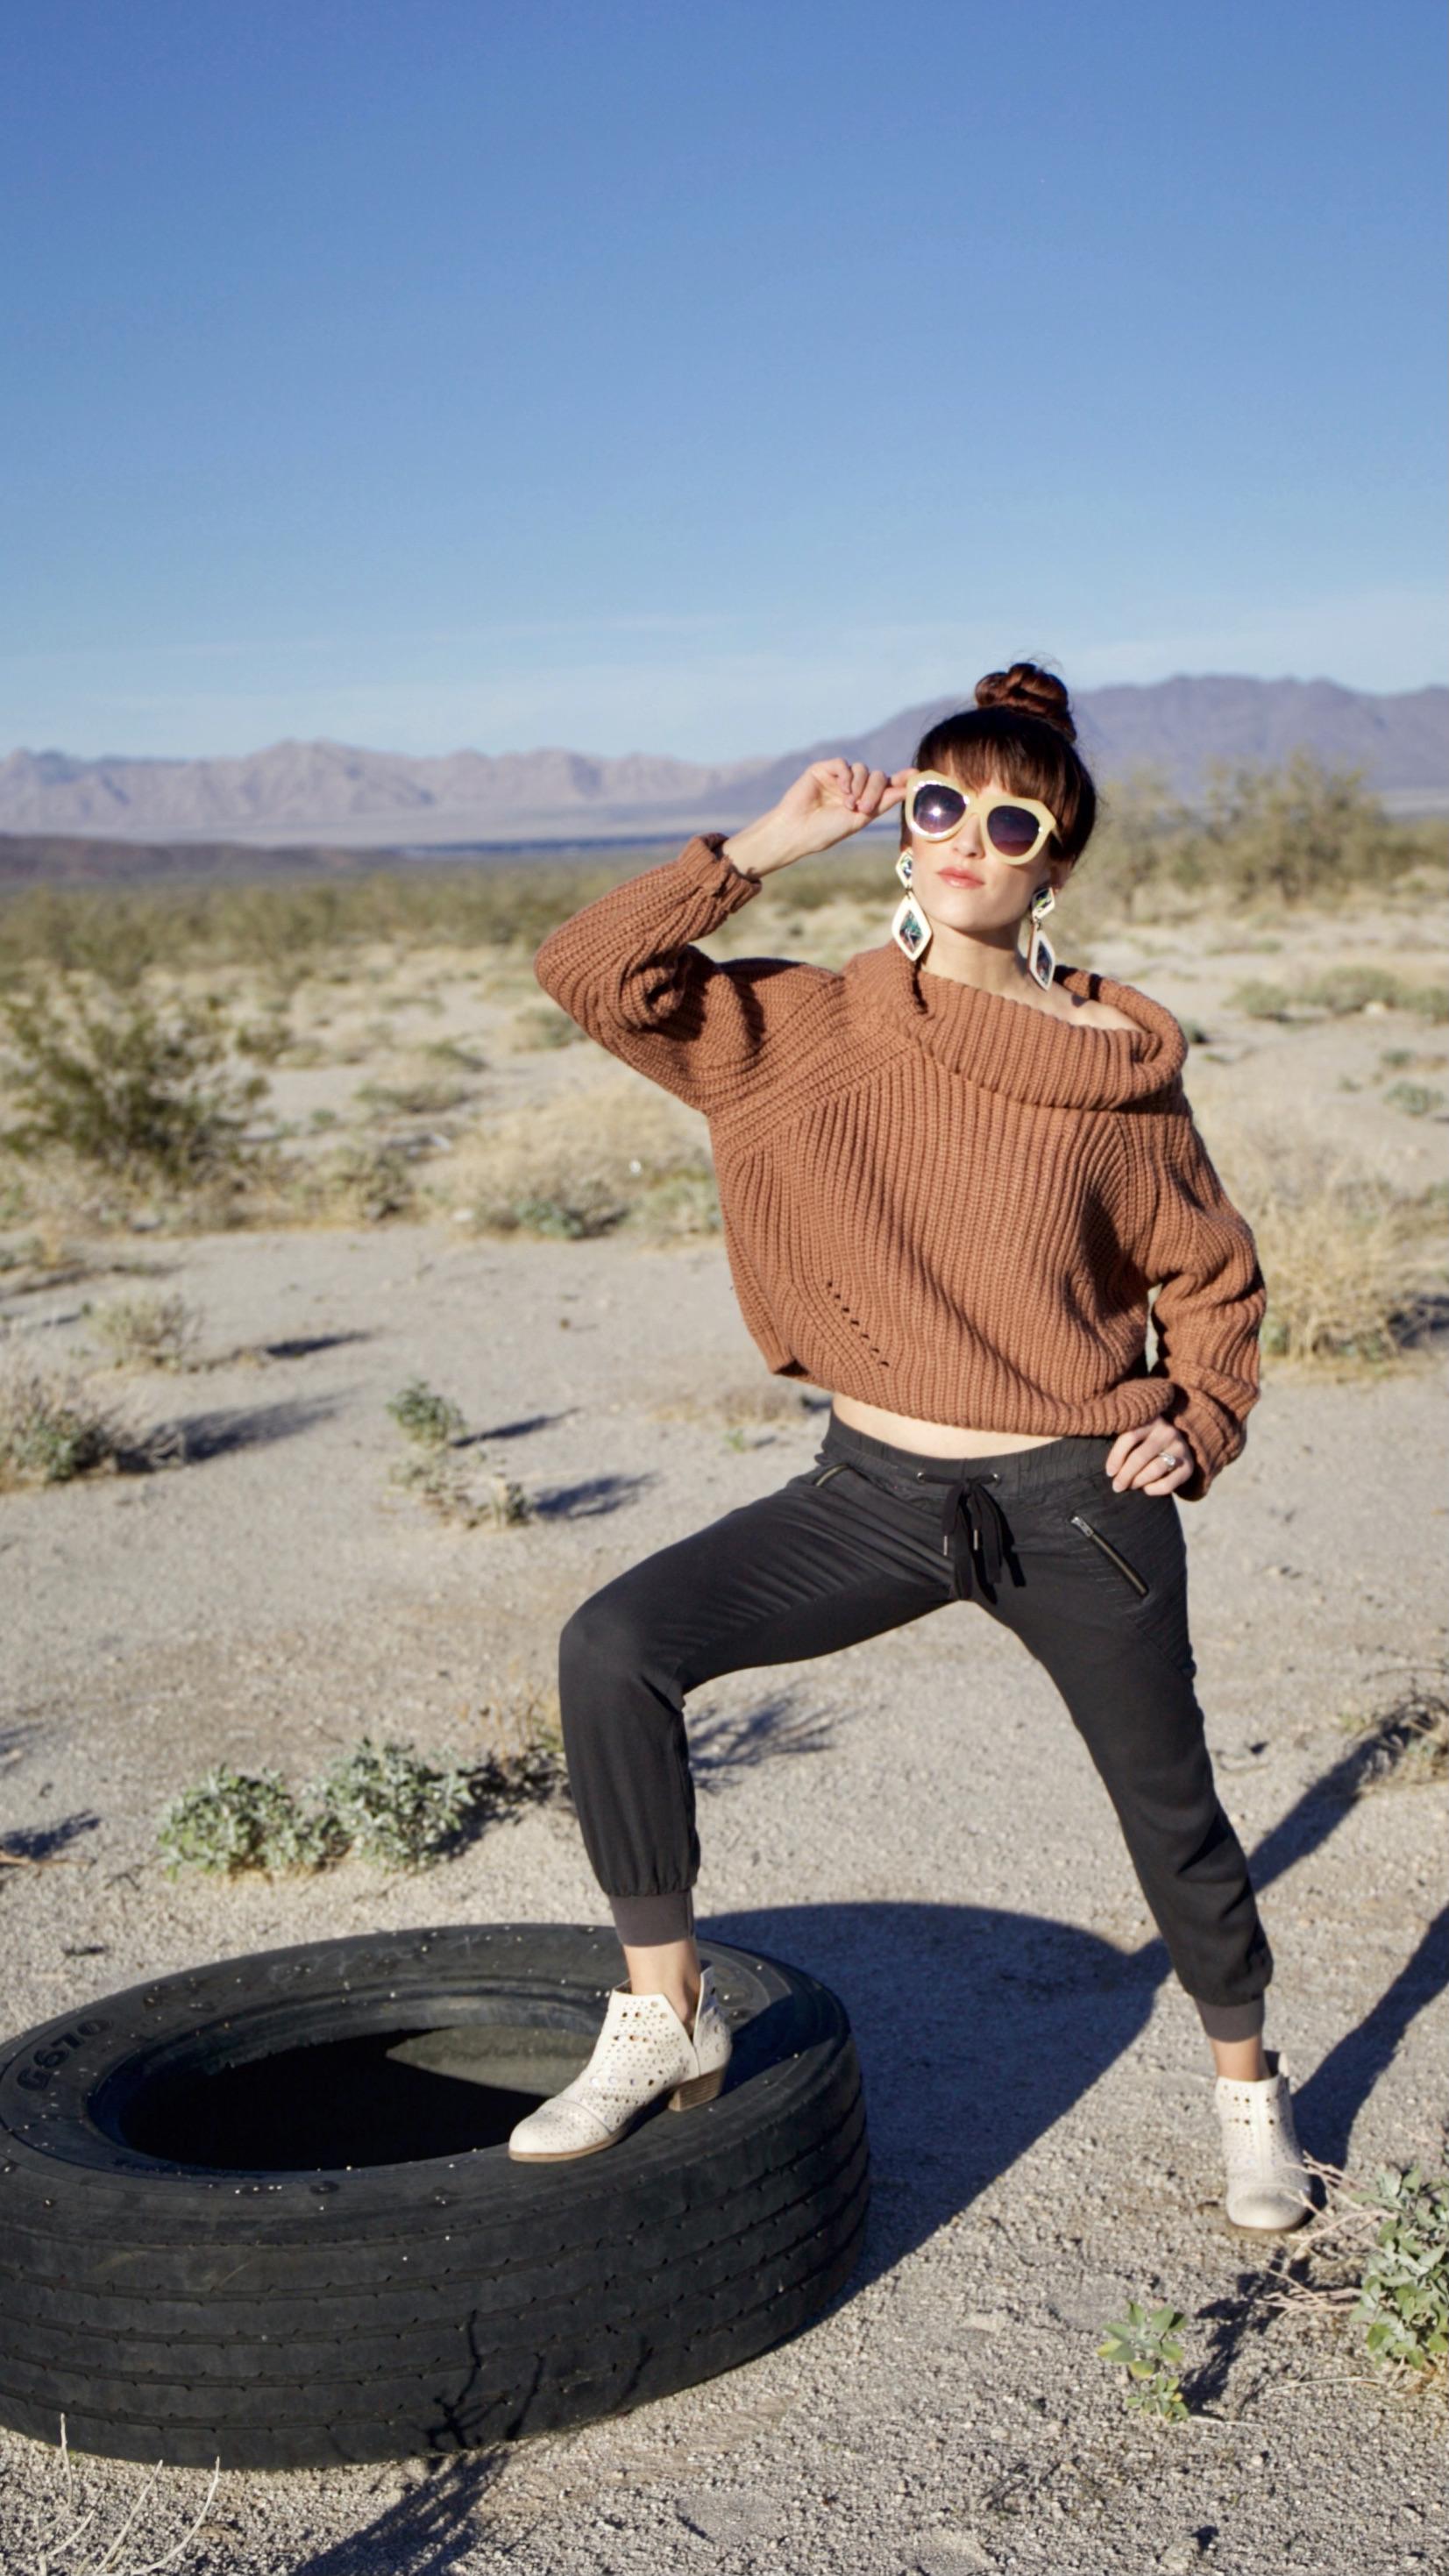 Alyssa Bird standing on an old tire in the desert in Arizona